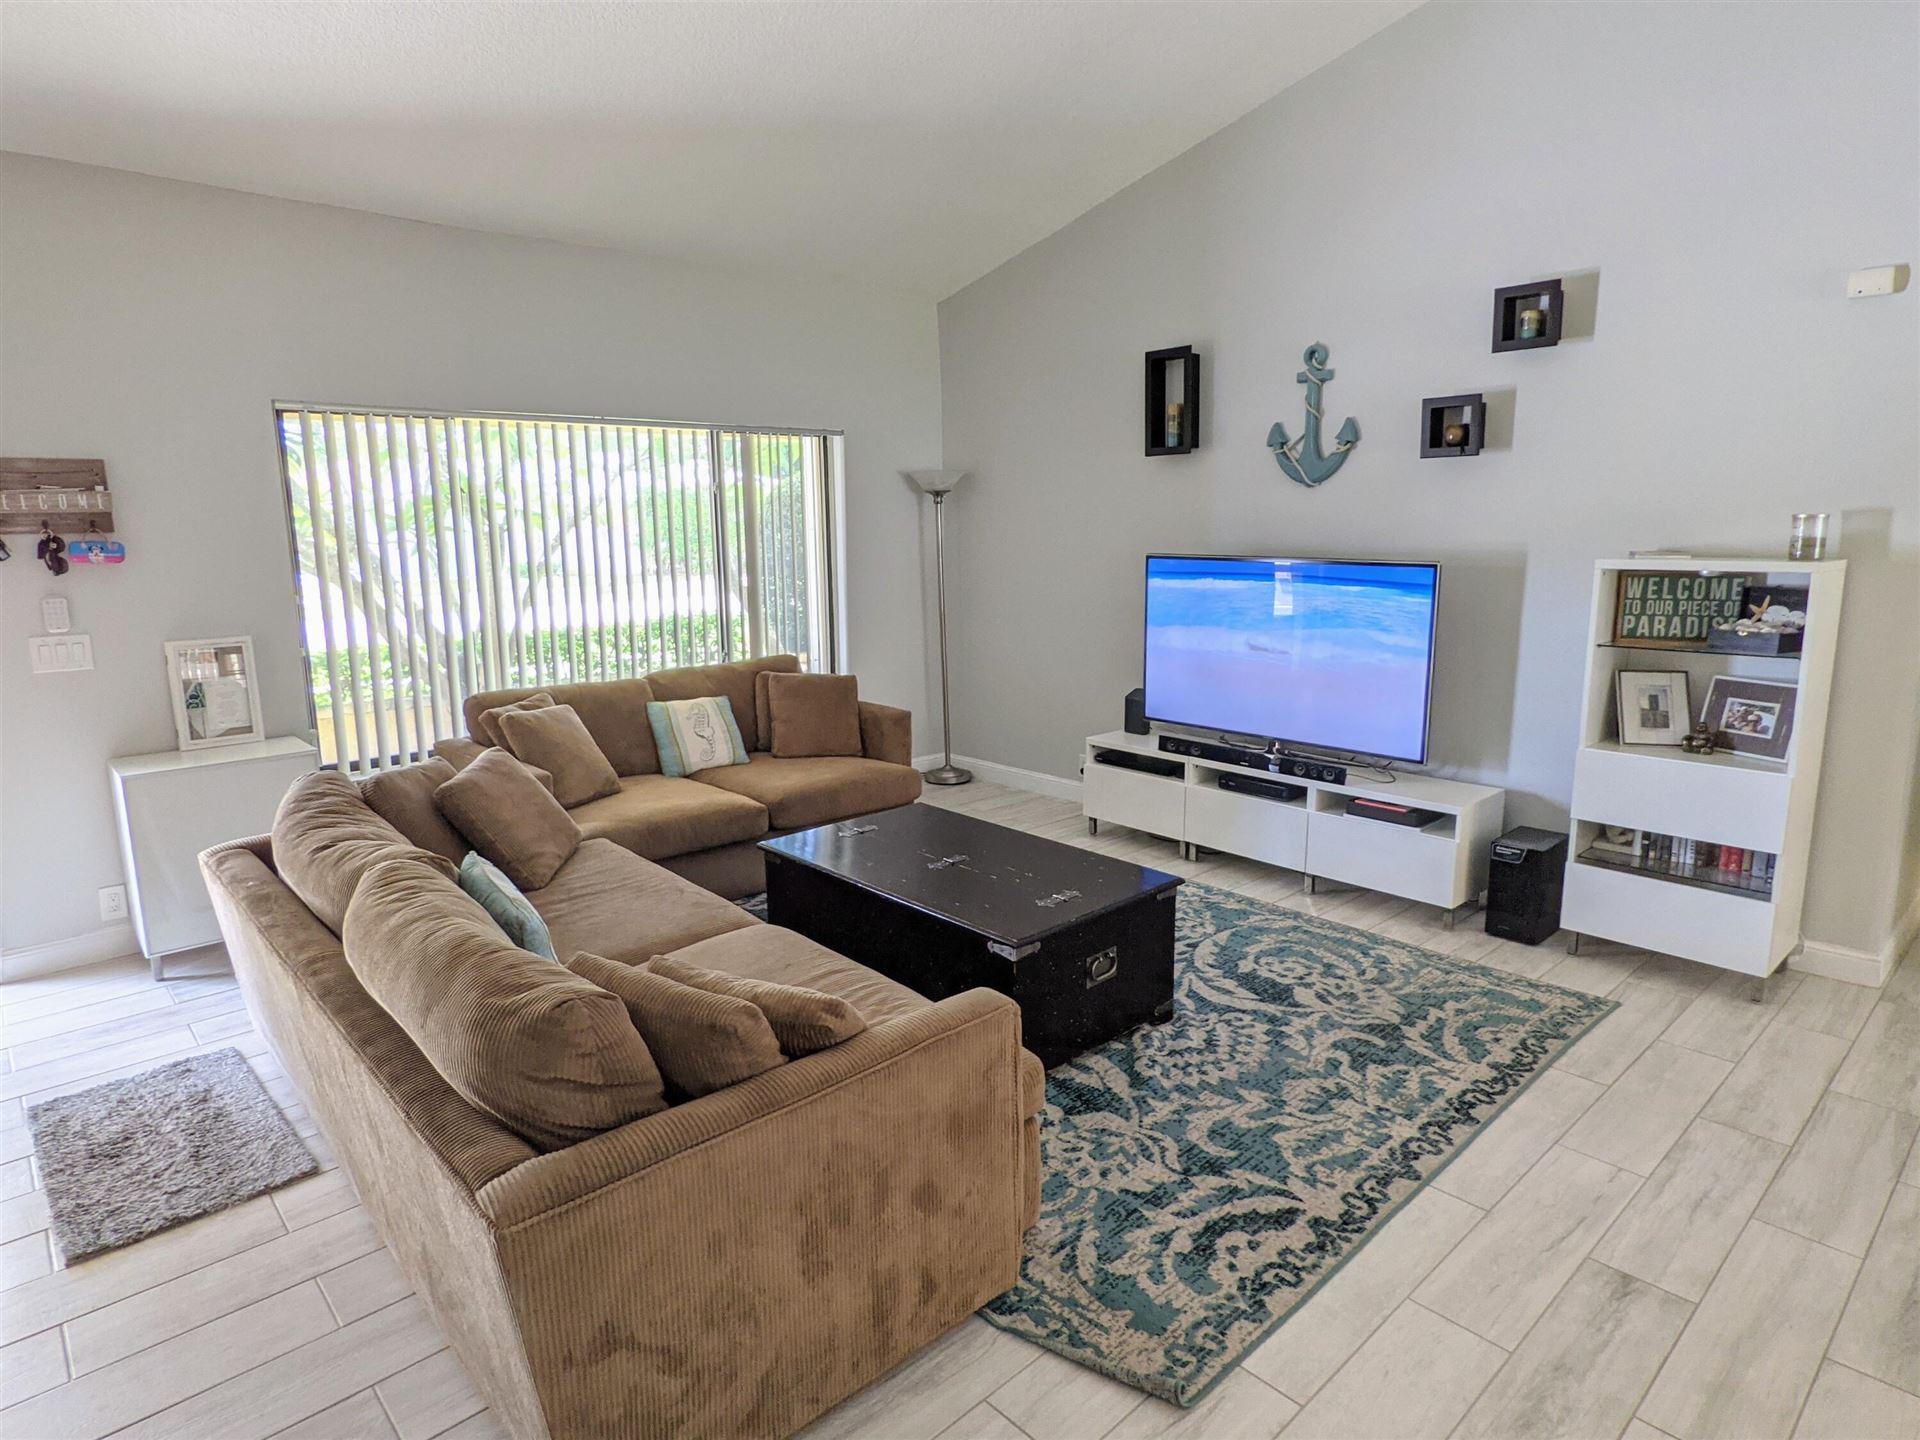 4998 Covey Trail, Boca Raton, FL 33487 - #: RX-10723687